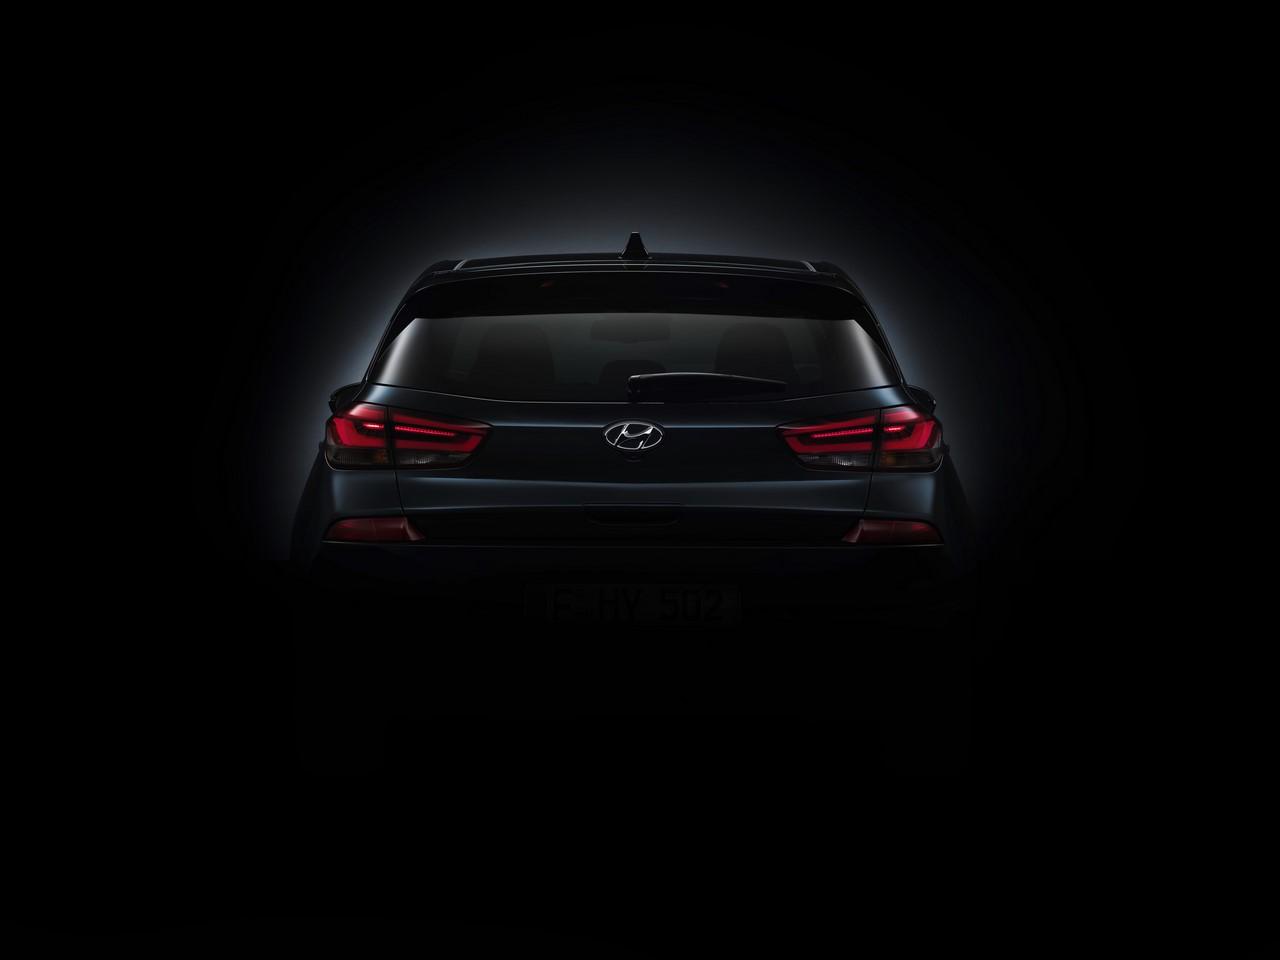 2017 Hyundai i30 rear teaser